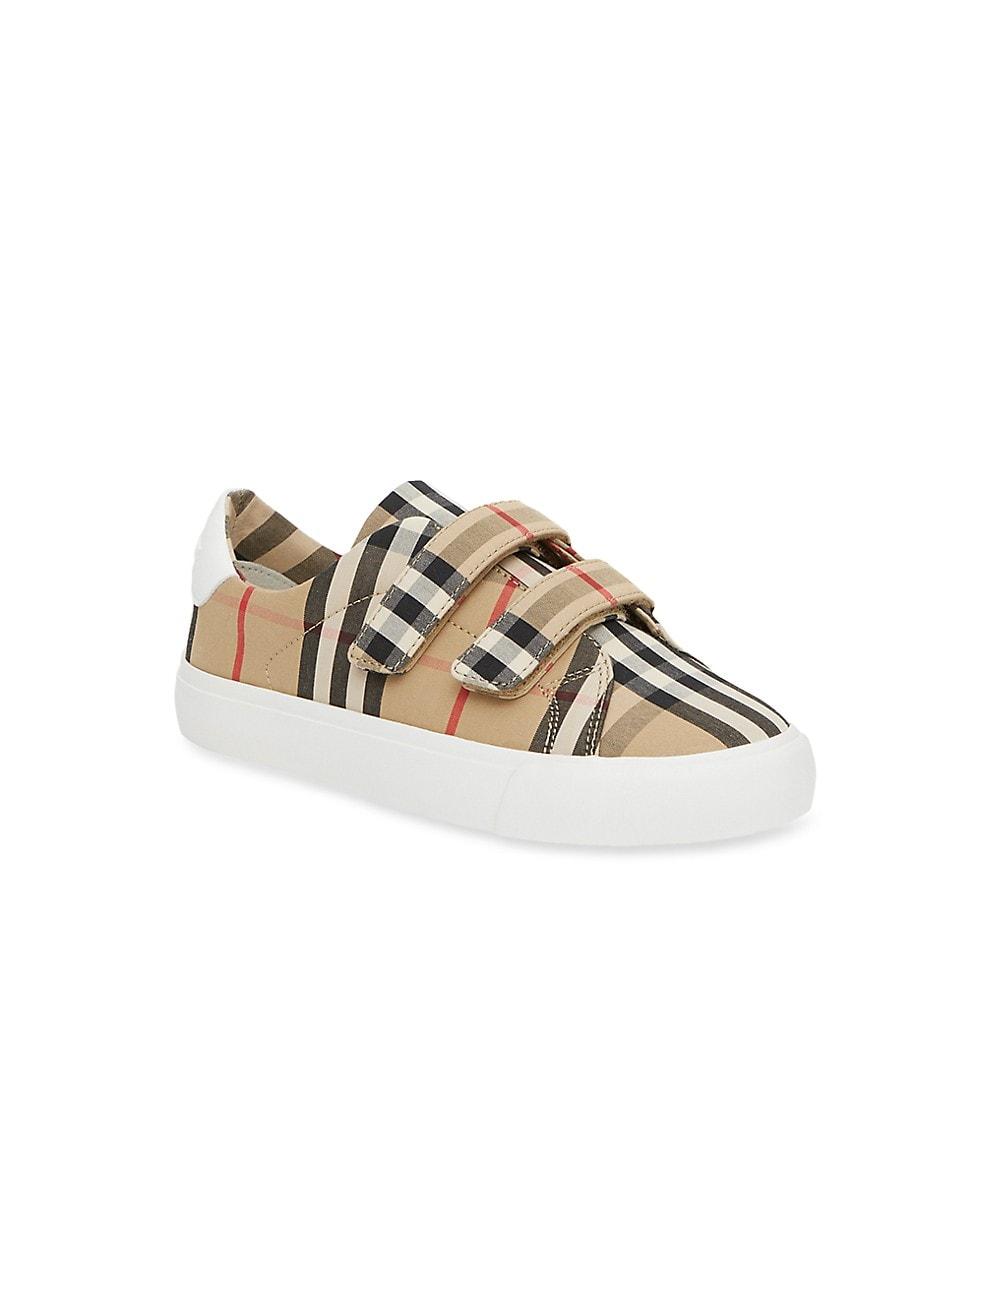 Burberry Babys & Little Kids Mini Markham Check Sneakers